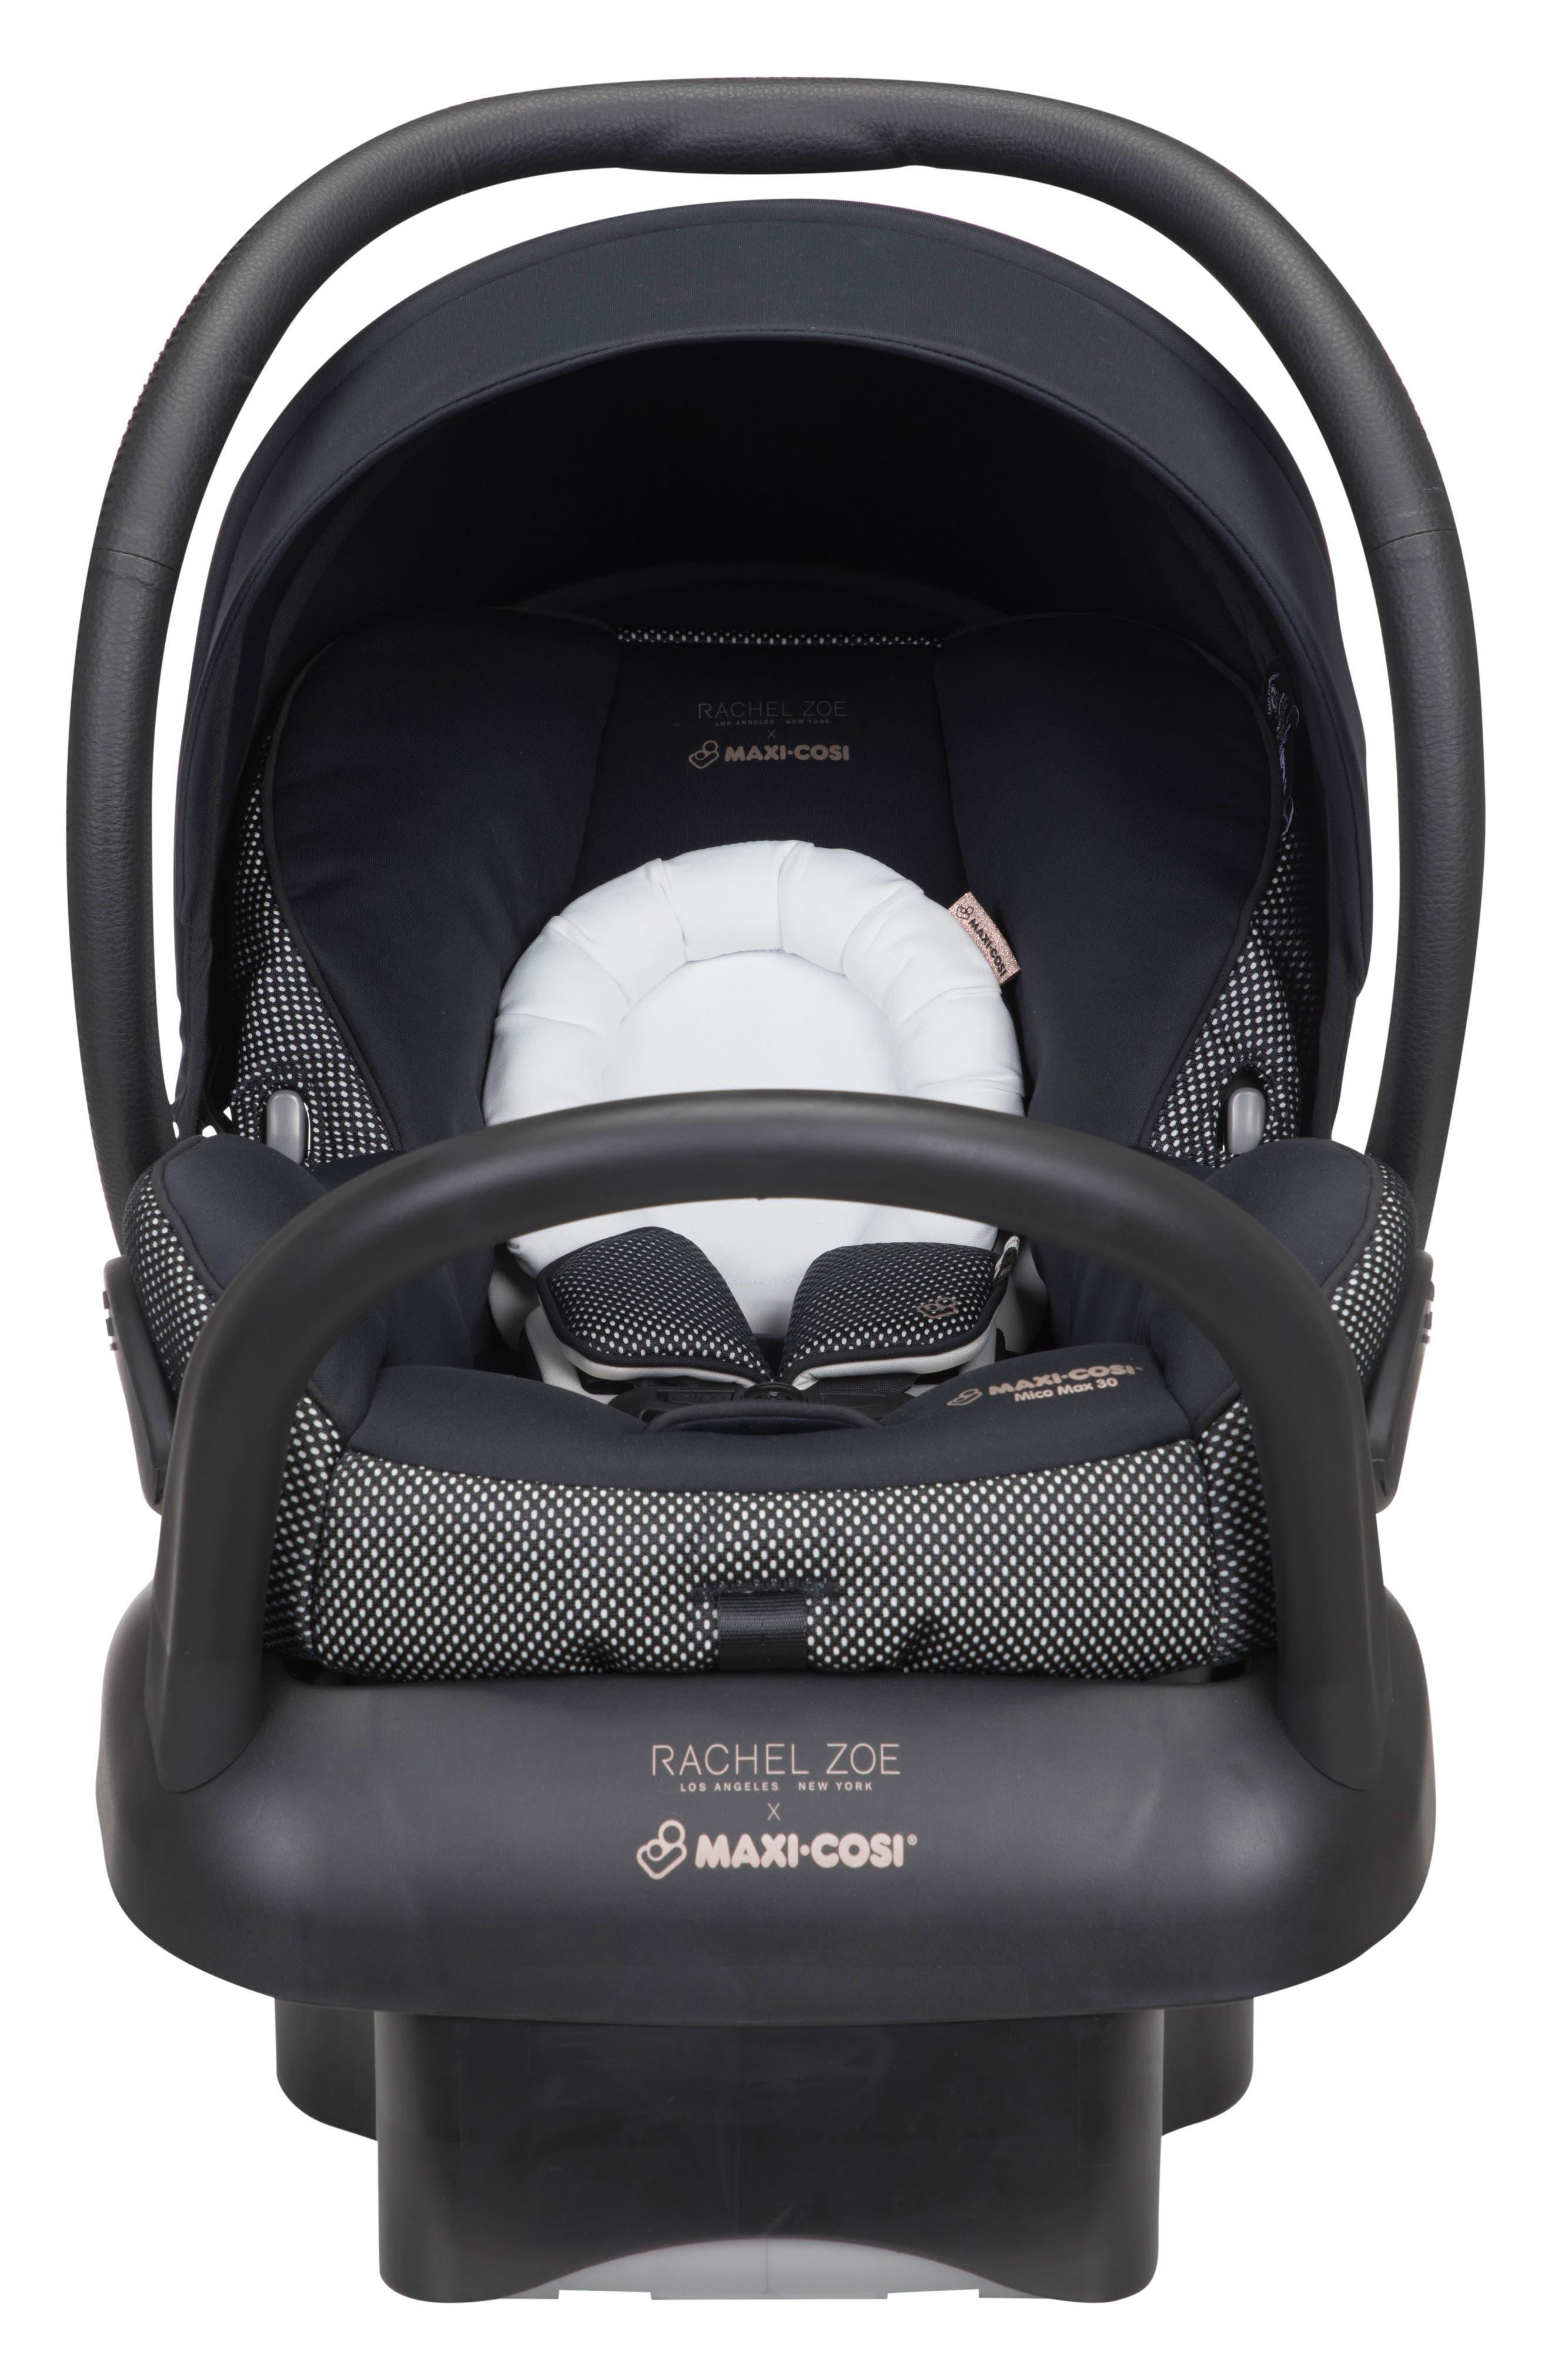 Main Image - Maxi-Cosi® x Rachel Zoe Mico Max 30 - Luxe Sport Edition Car Seat (Nordstrom Exclusive)